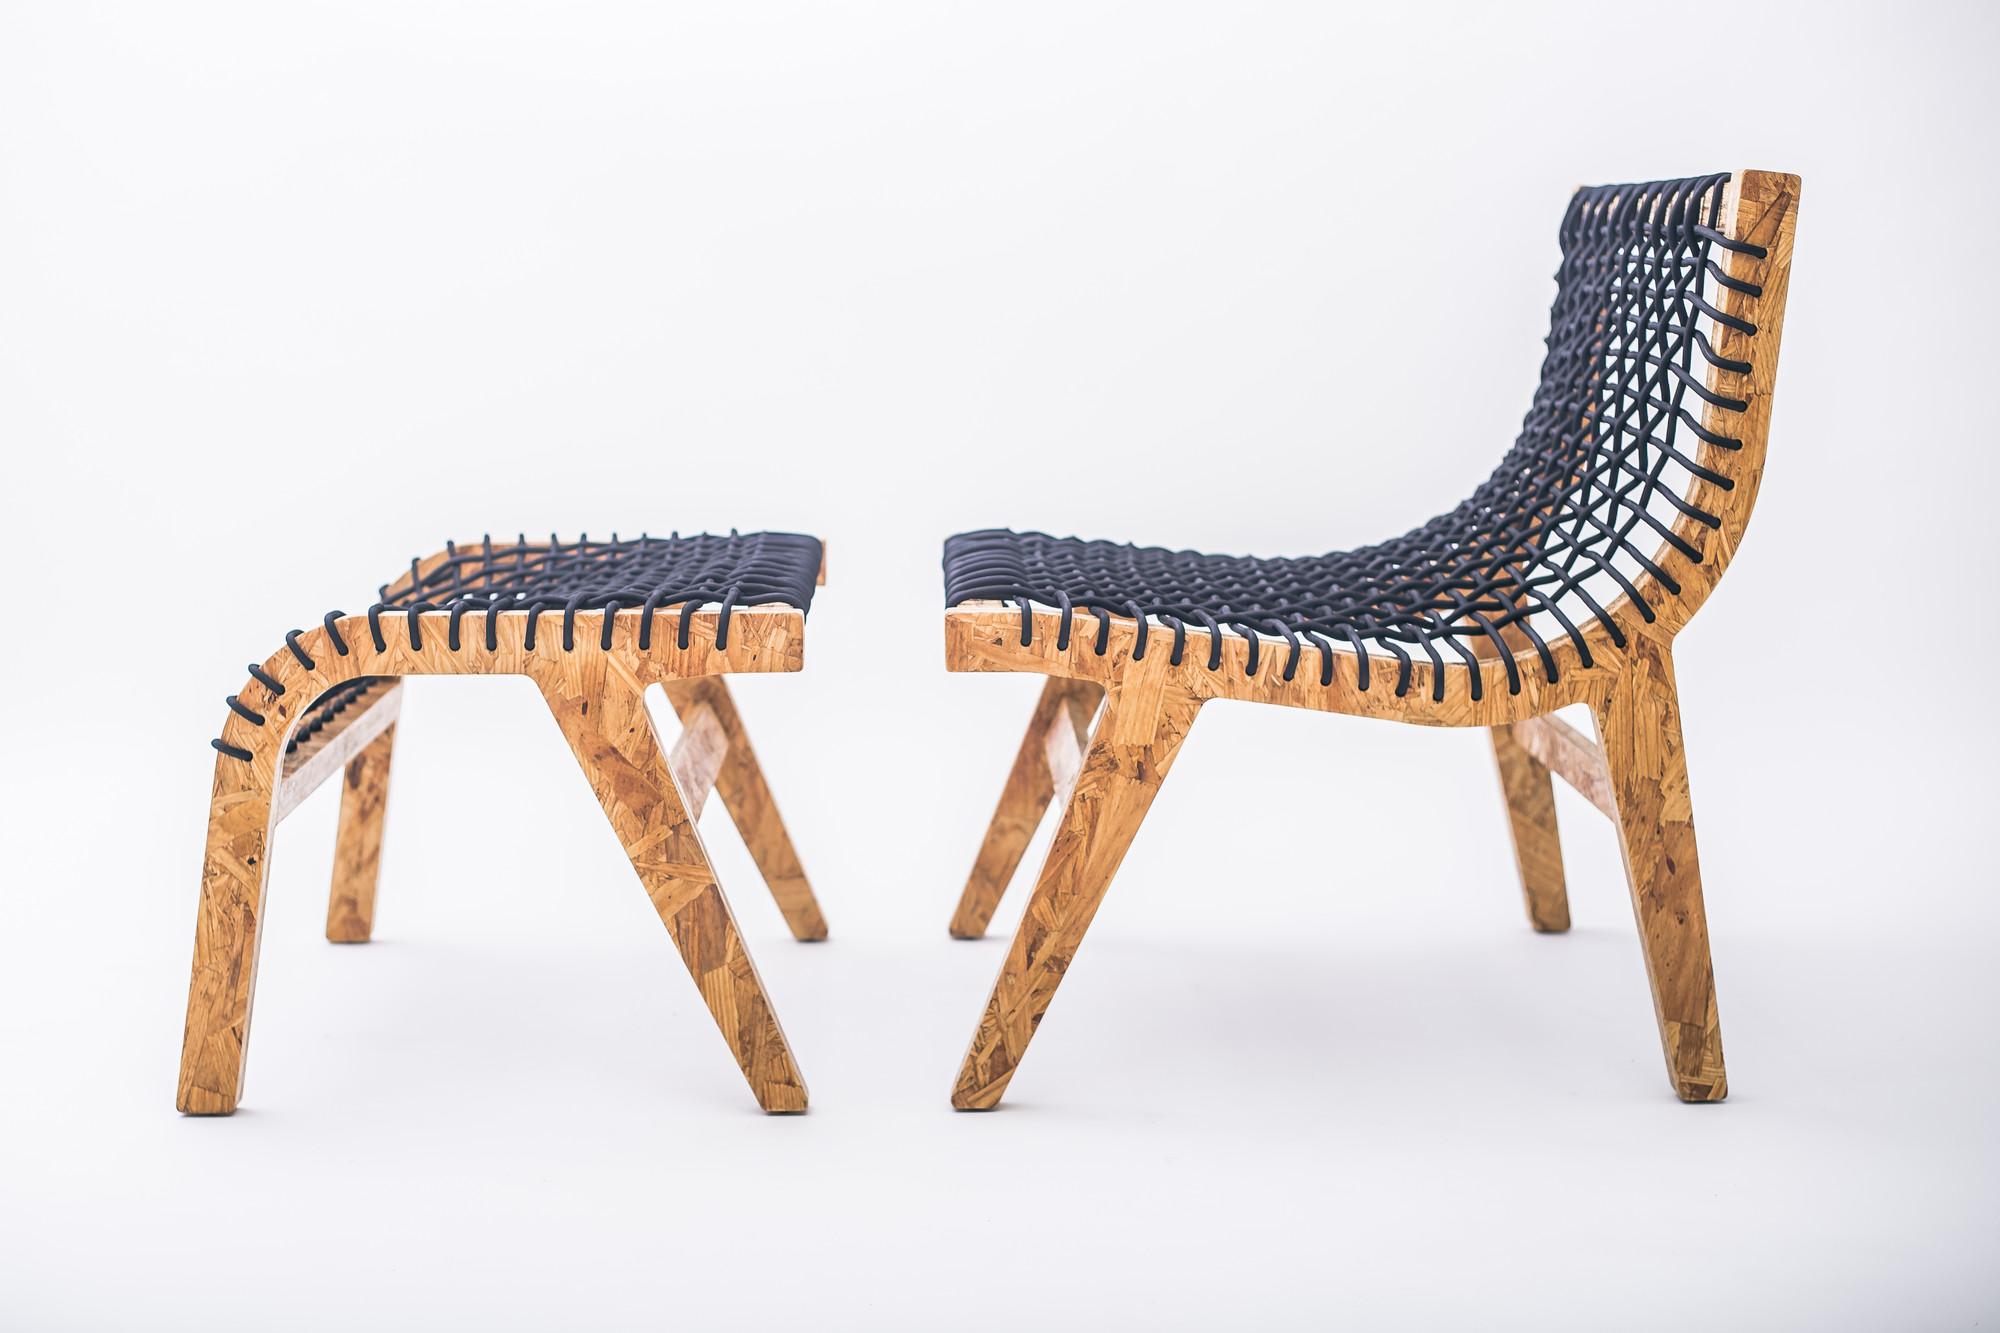 Silla y Otoman Clara / Ricardo Casas Design, Courtesy of NotWaste